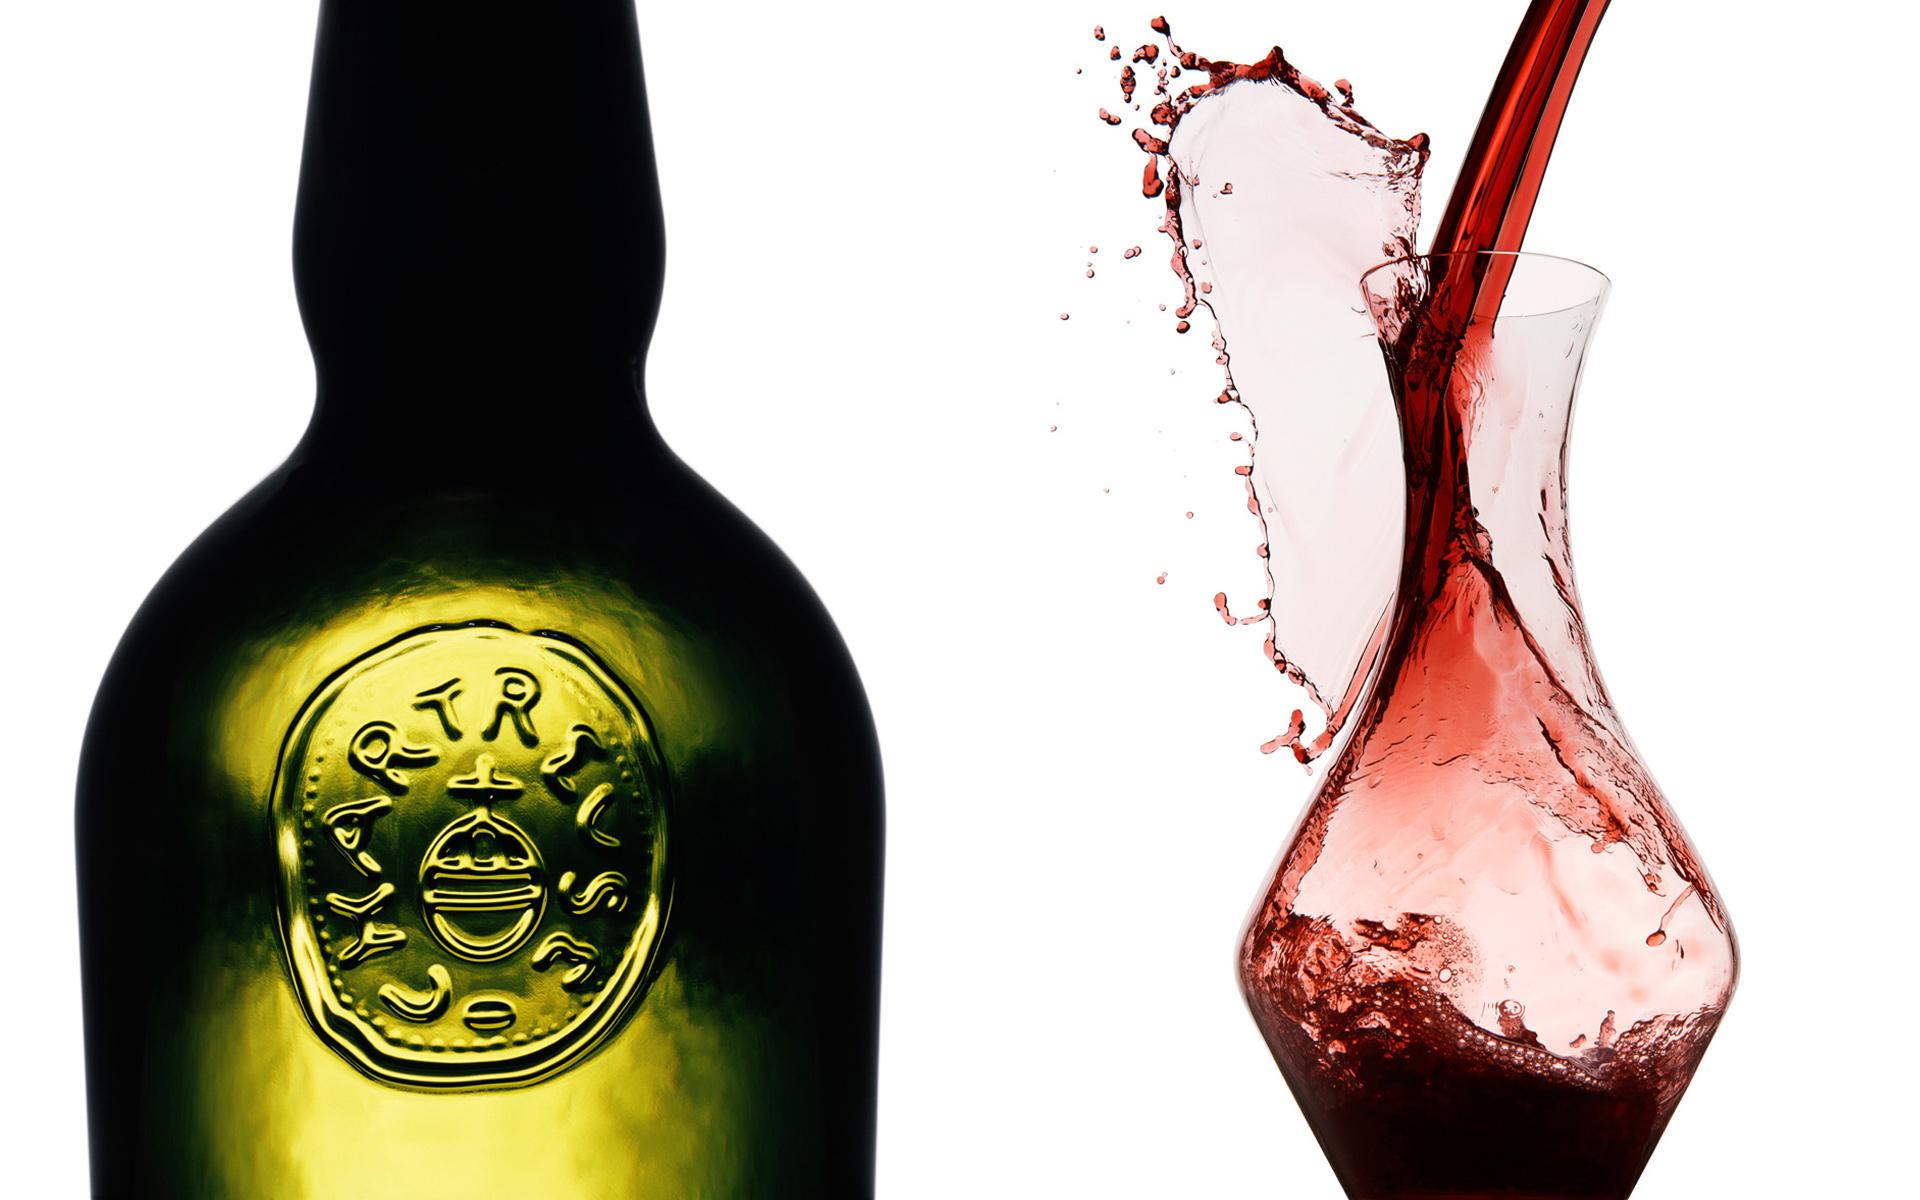 PR_Chartruse-wine_sq.jpg